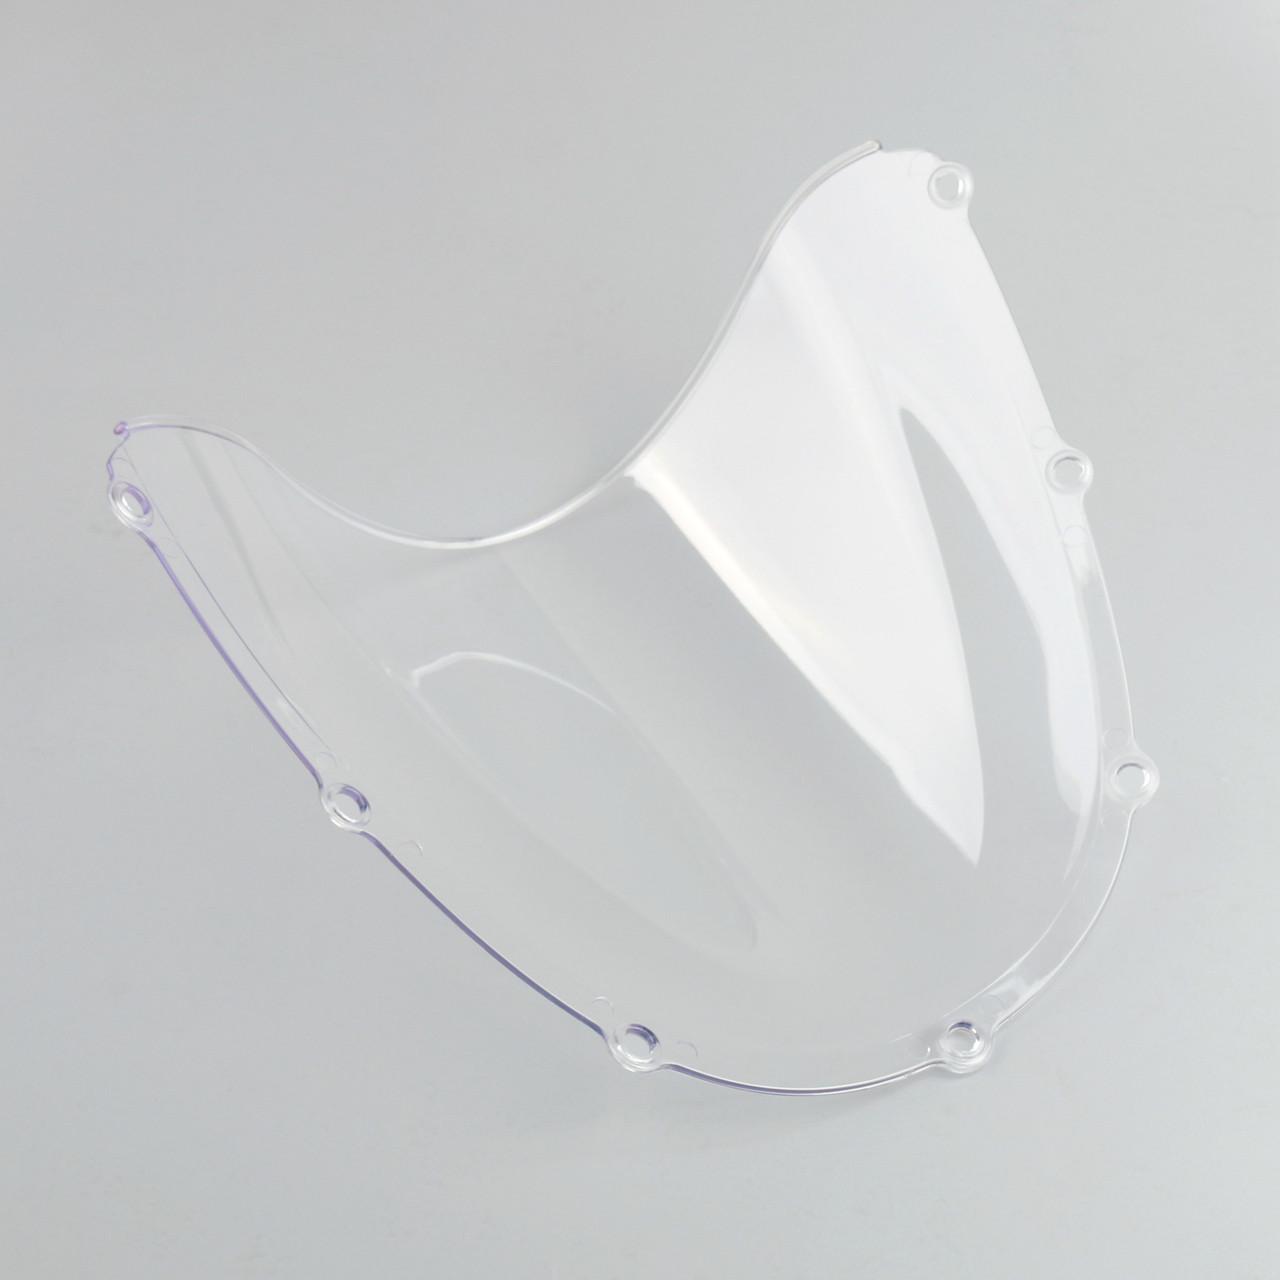 Windscreen Windshield Honda CBR 954 RR (2001-2003), Double Bubble, Clear